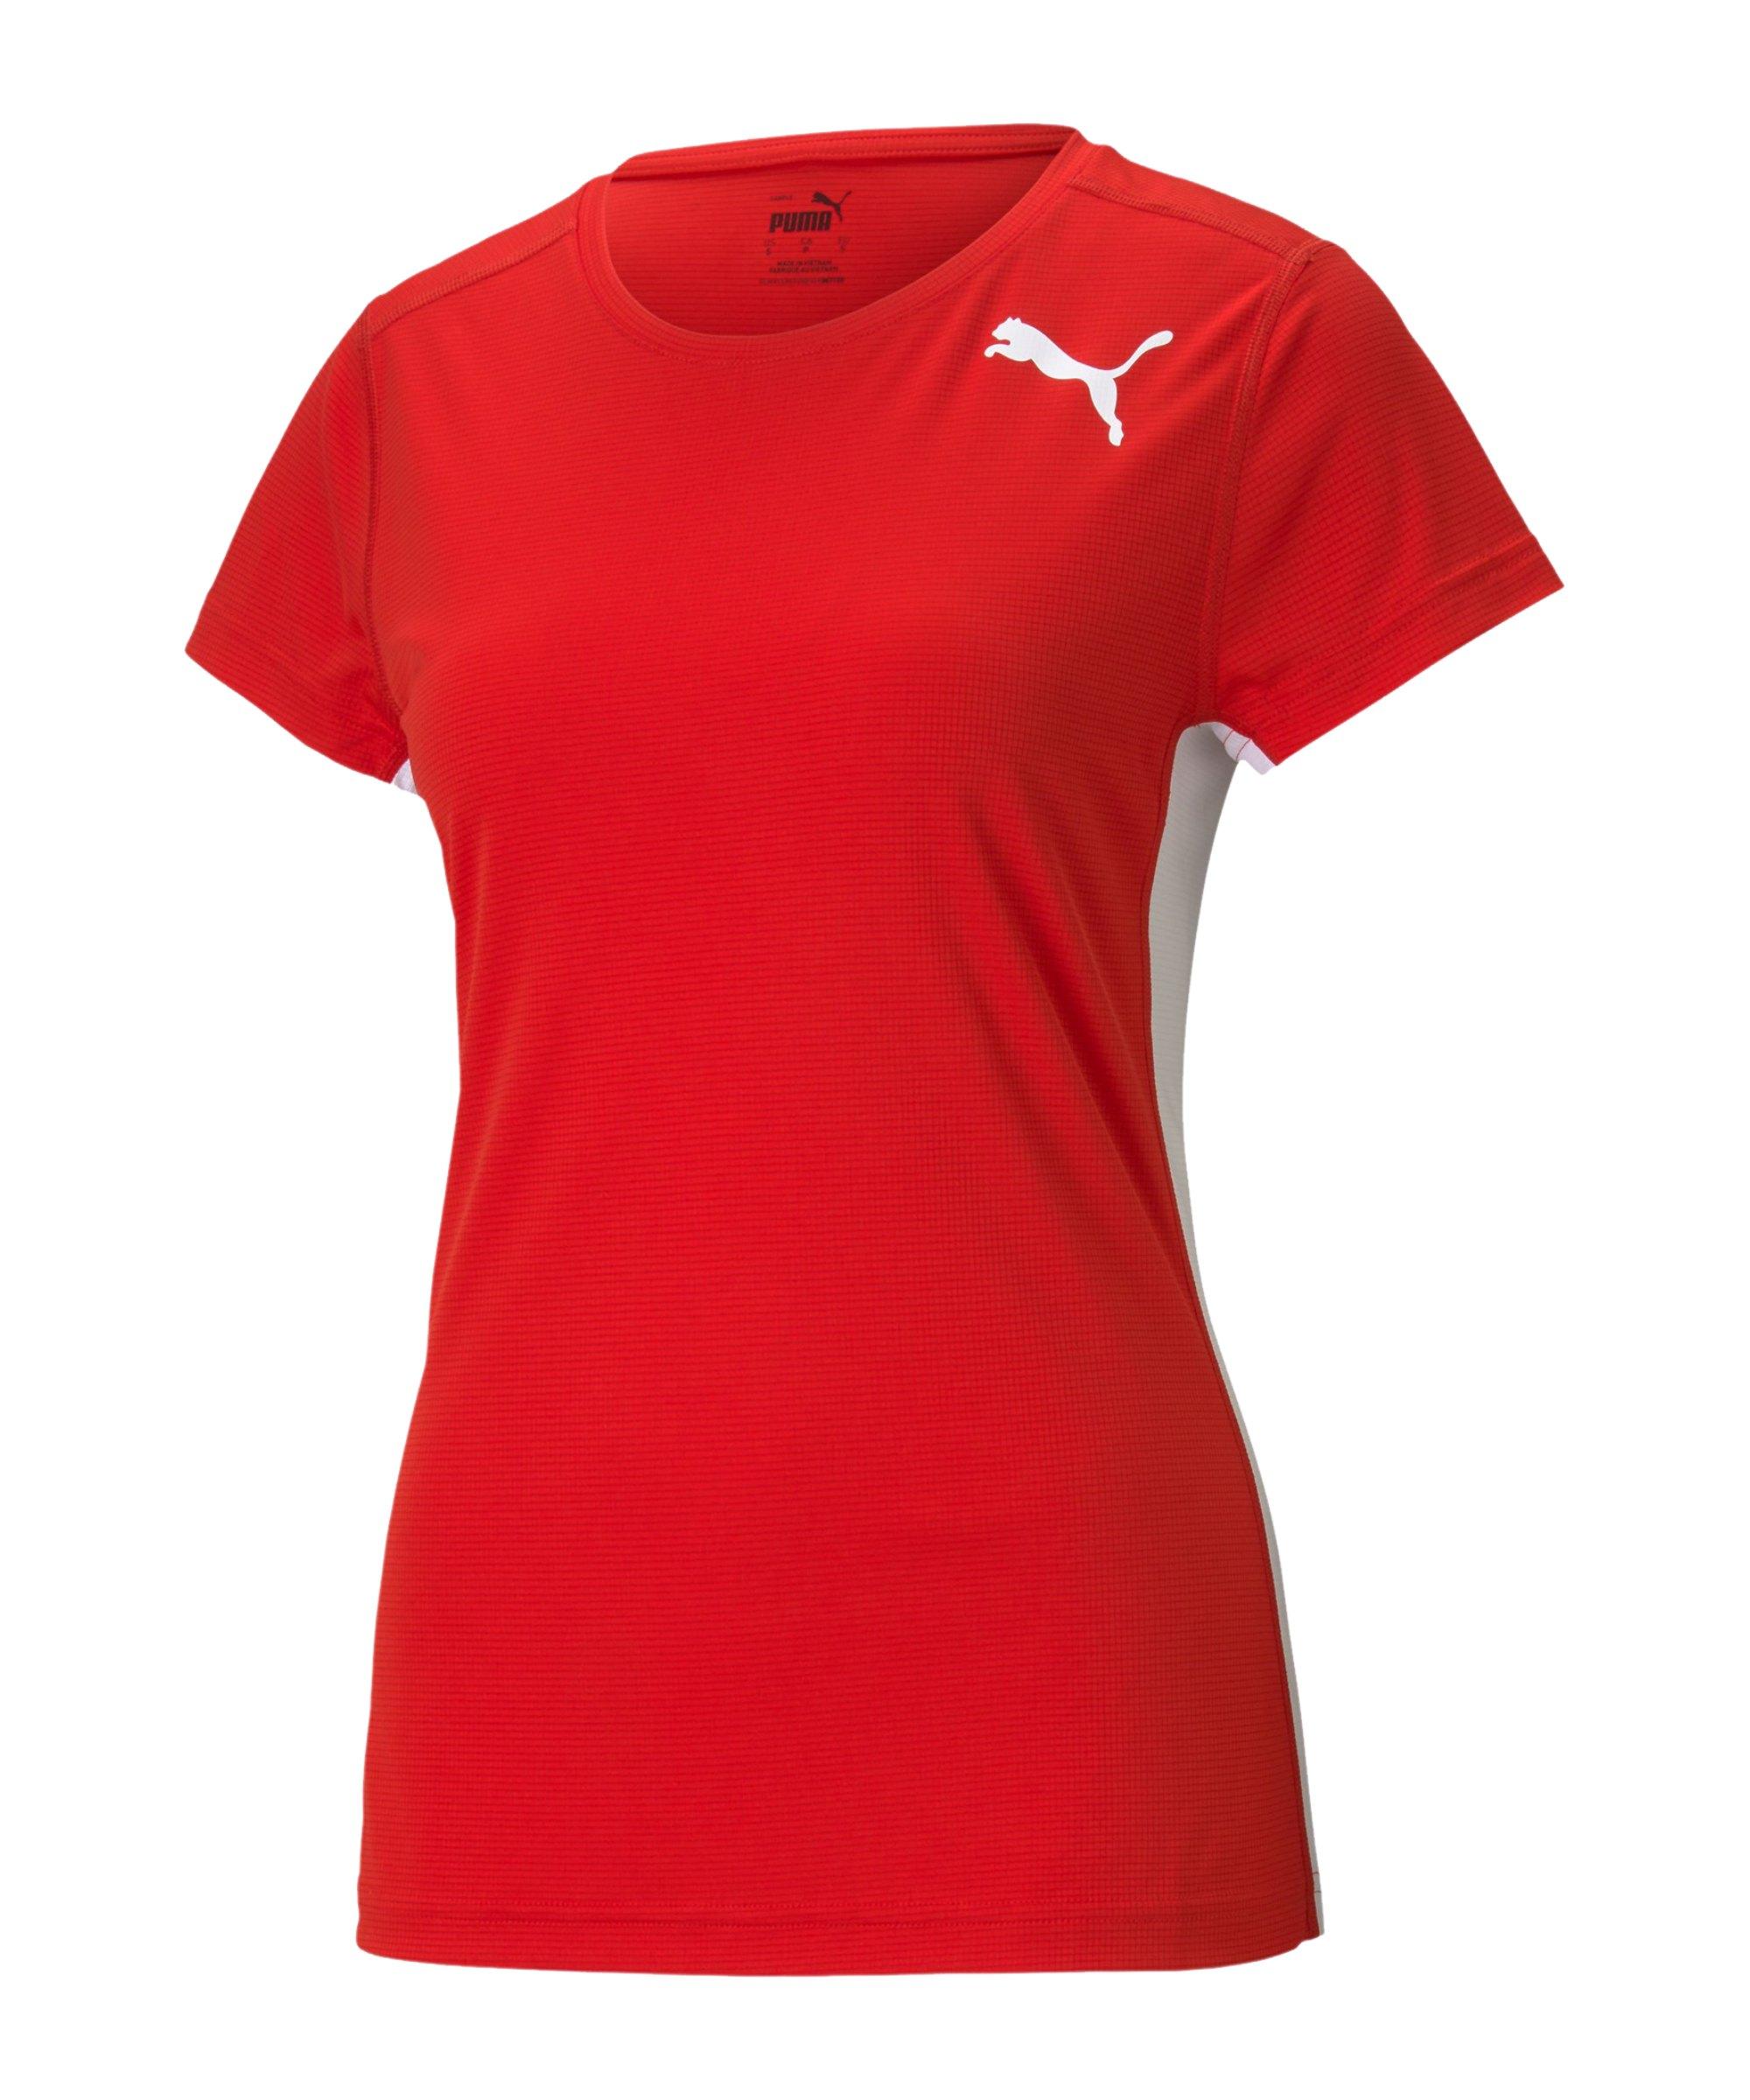 PUMA Cross the Line 2.0 T-Shirt Training Damen F05 - rot